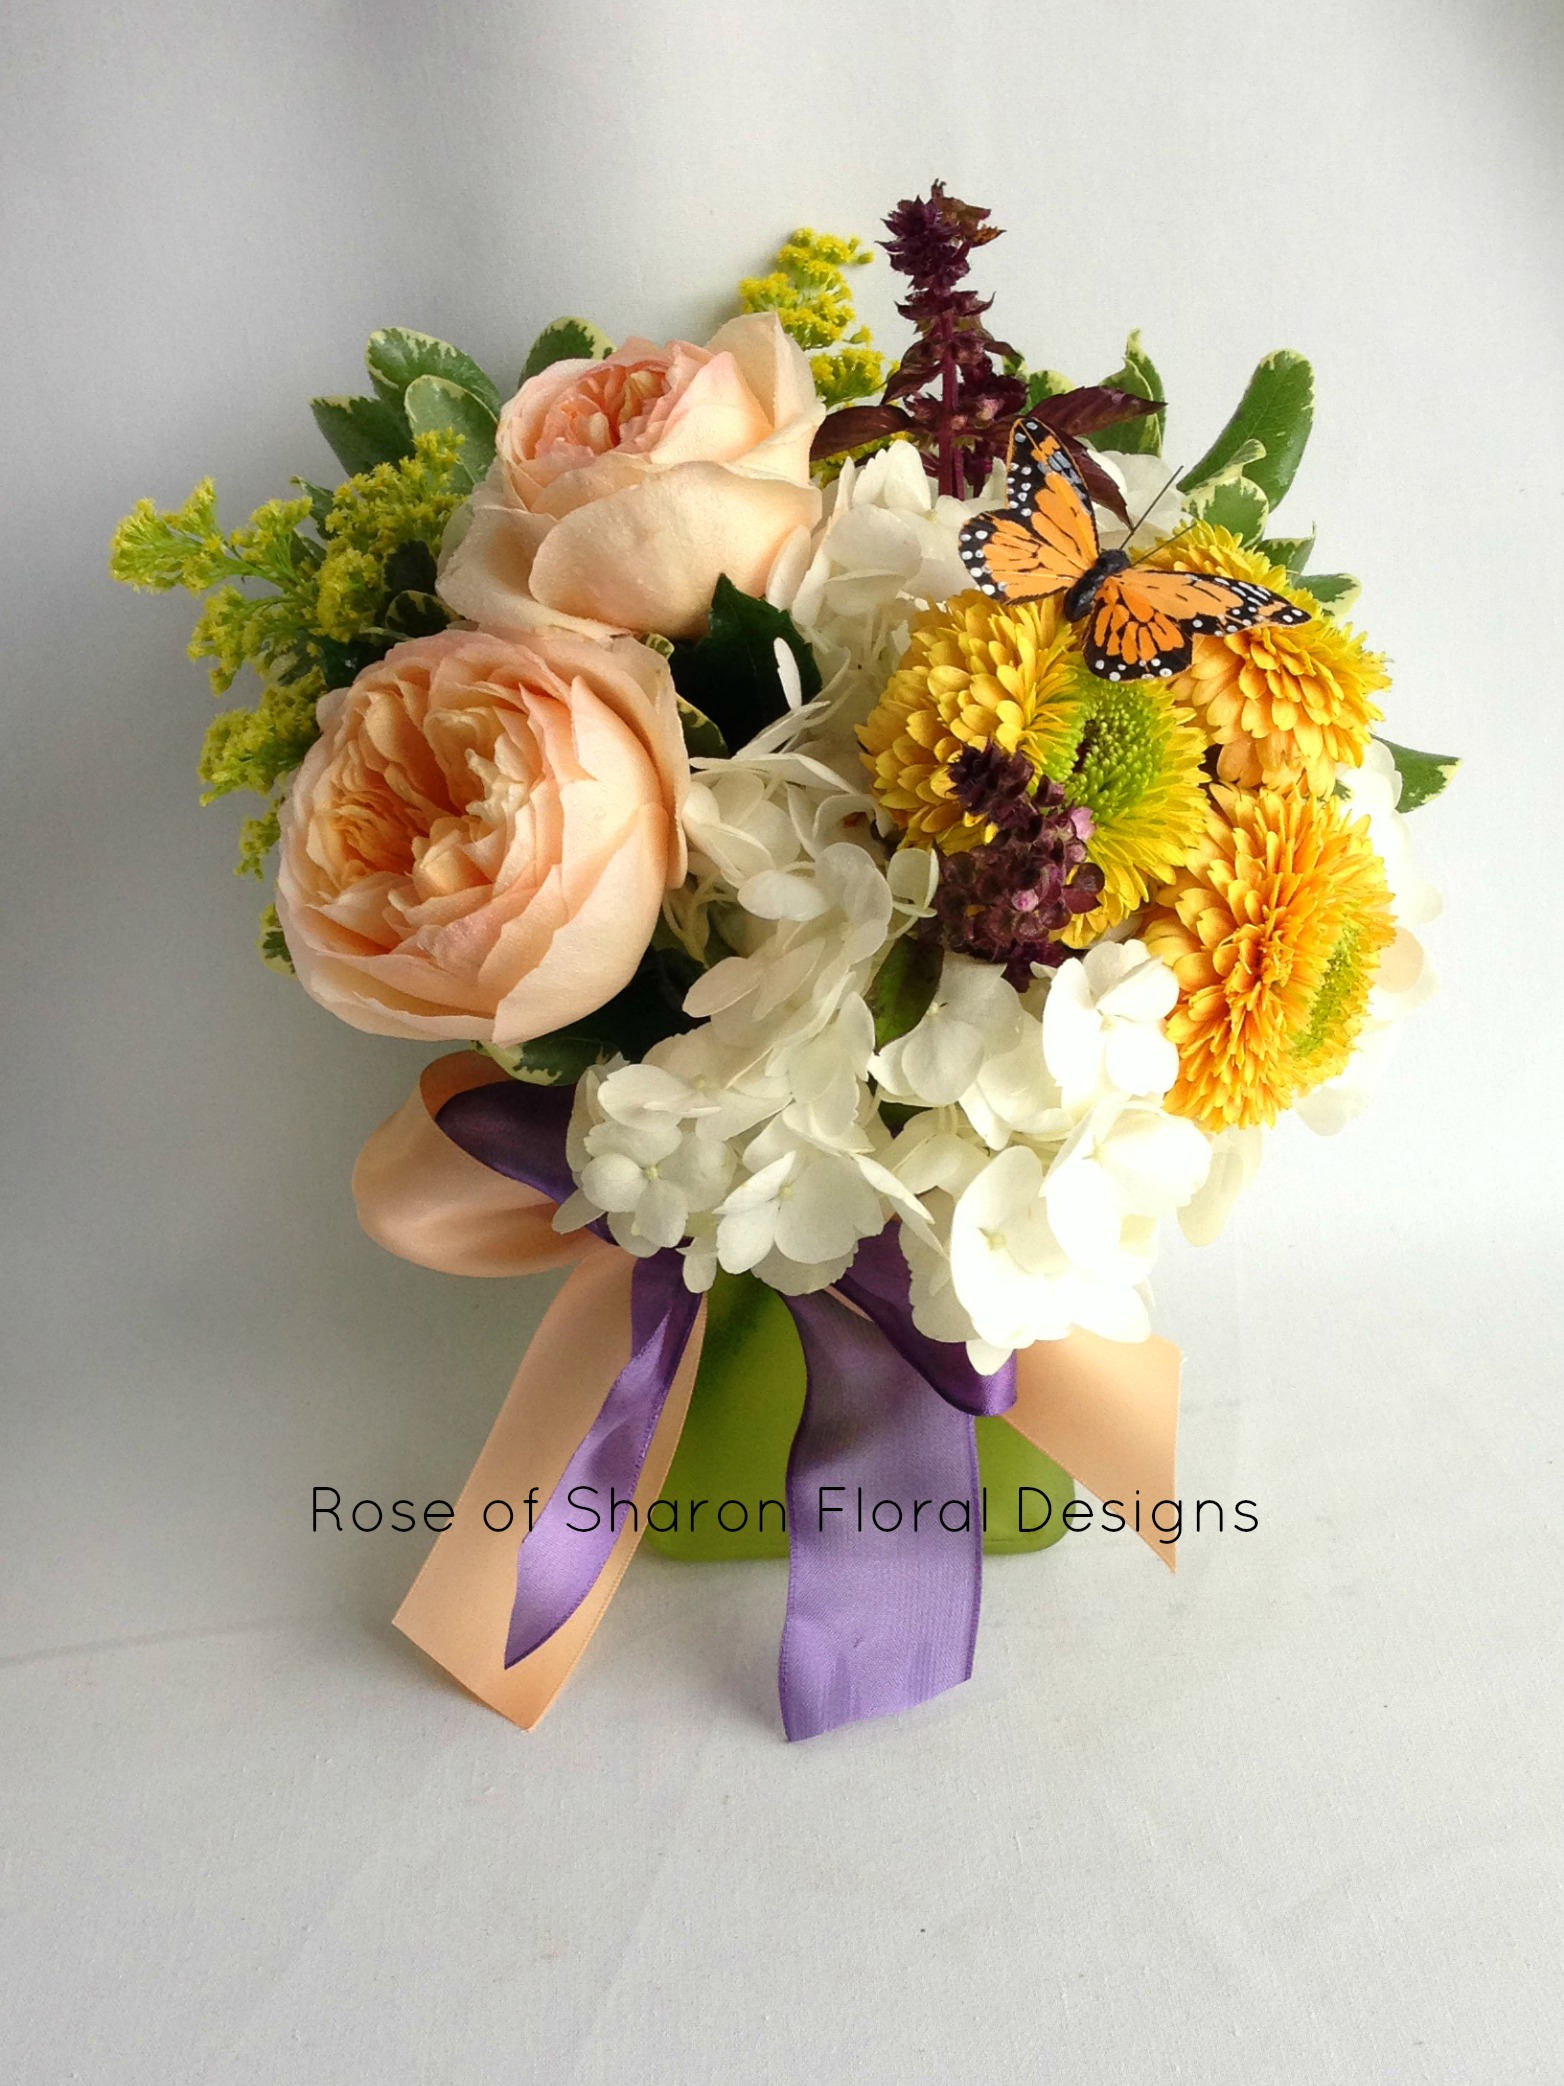 Butterfly Garden Arrangement with Garden Roses, Rose of Sharon Floral Designs